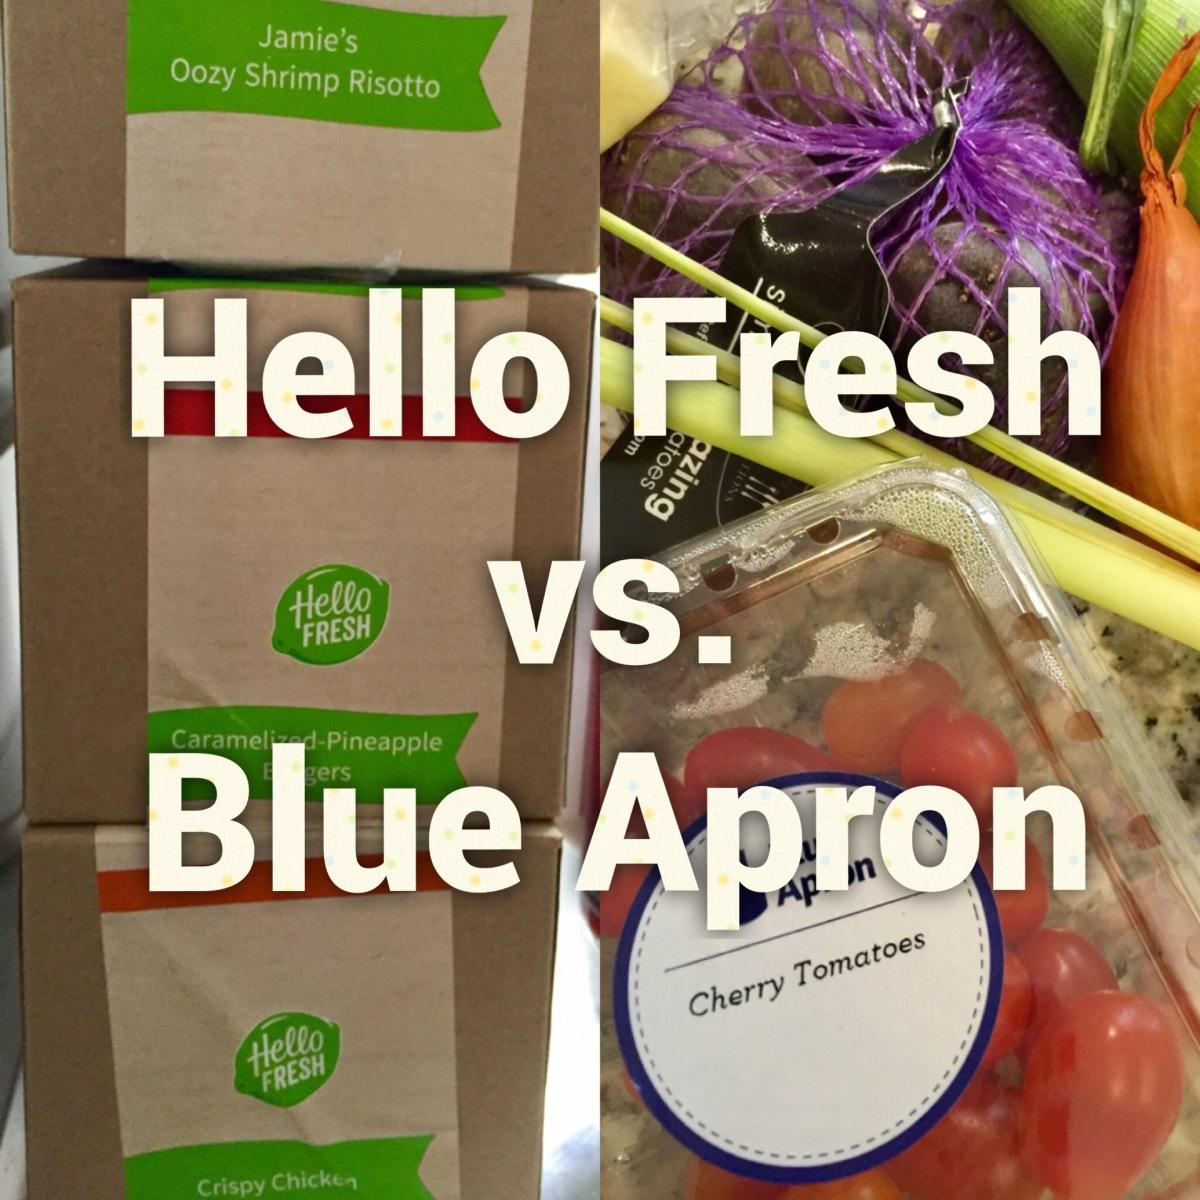 Blue apron vs hello fresh - Blue Apron Vs Hello Fresh 66